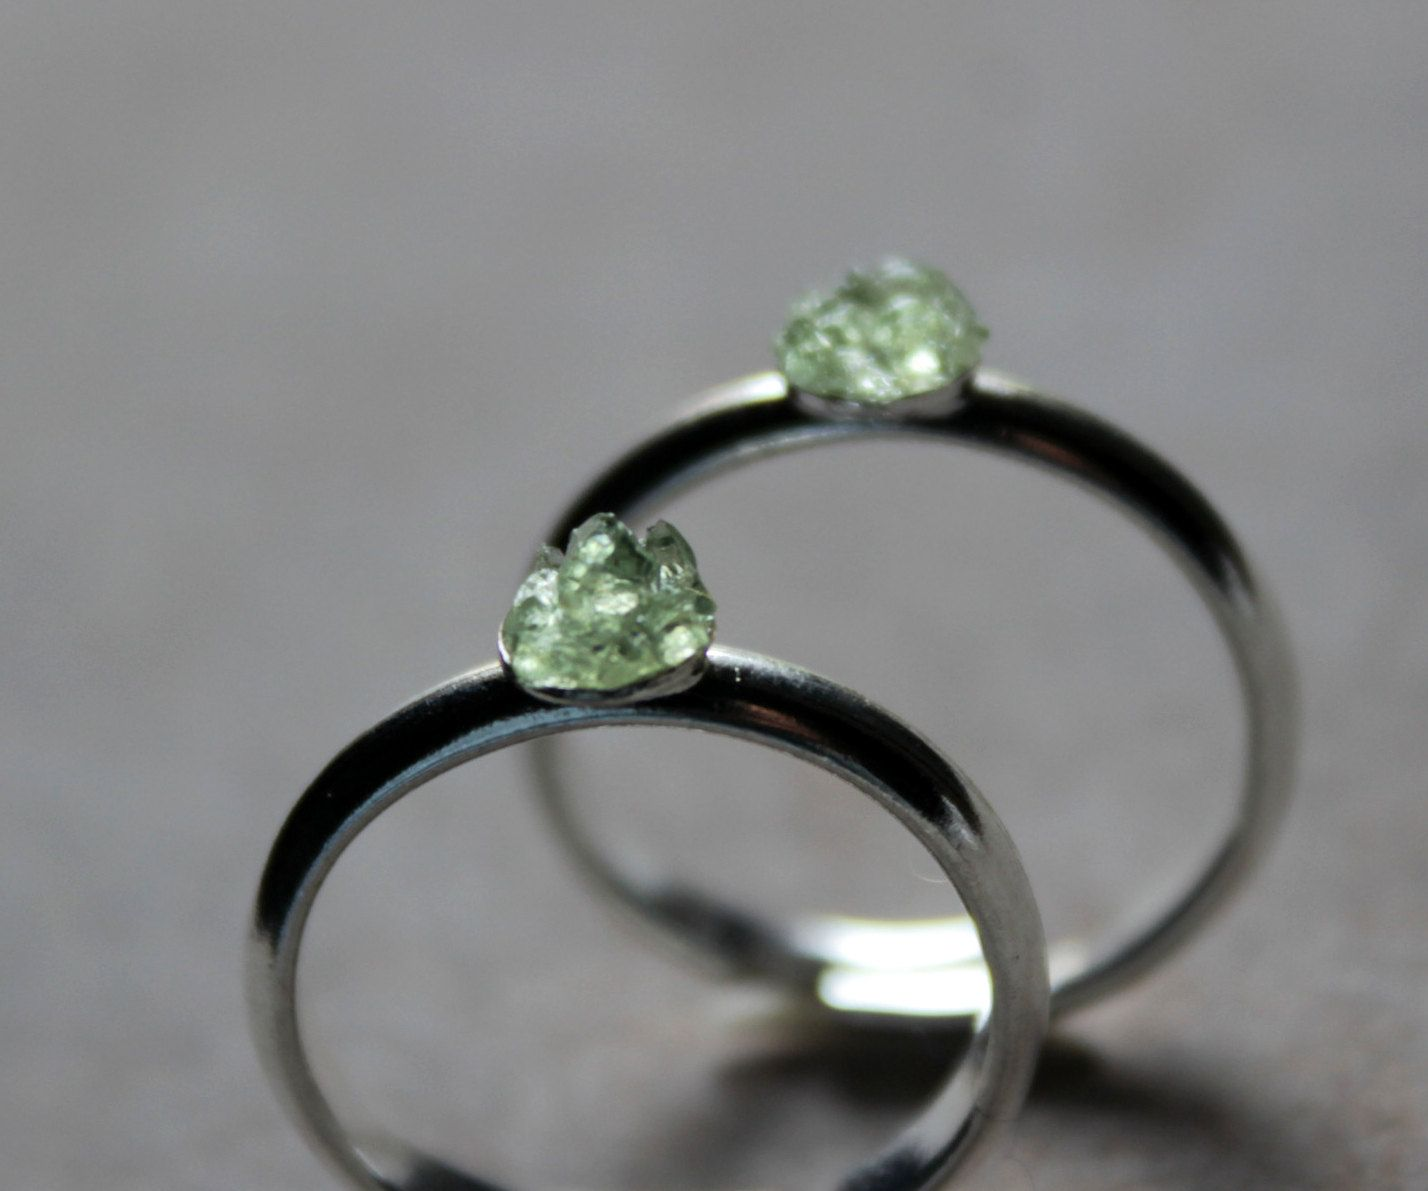 #Etsy#peridot#mineral#jewelry#jewellery#gemstone#ring#raw peridot#August…boho jewelry#boho ring